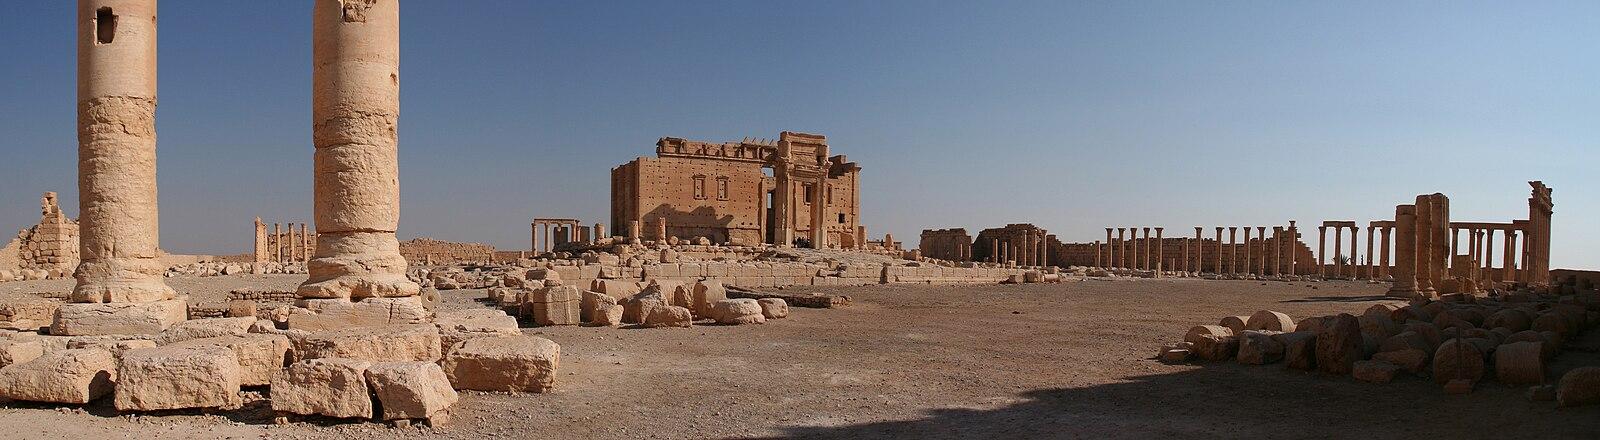 [Зображення: 1600px-Palmyra_Ruines_Temple_of_Bel.jpg]